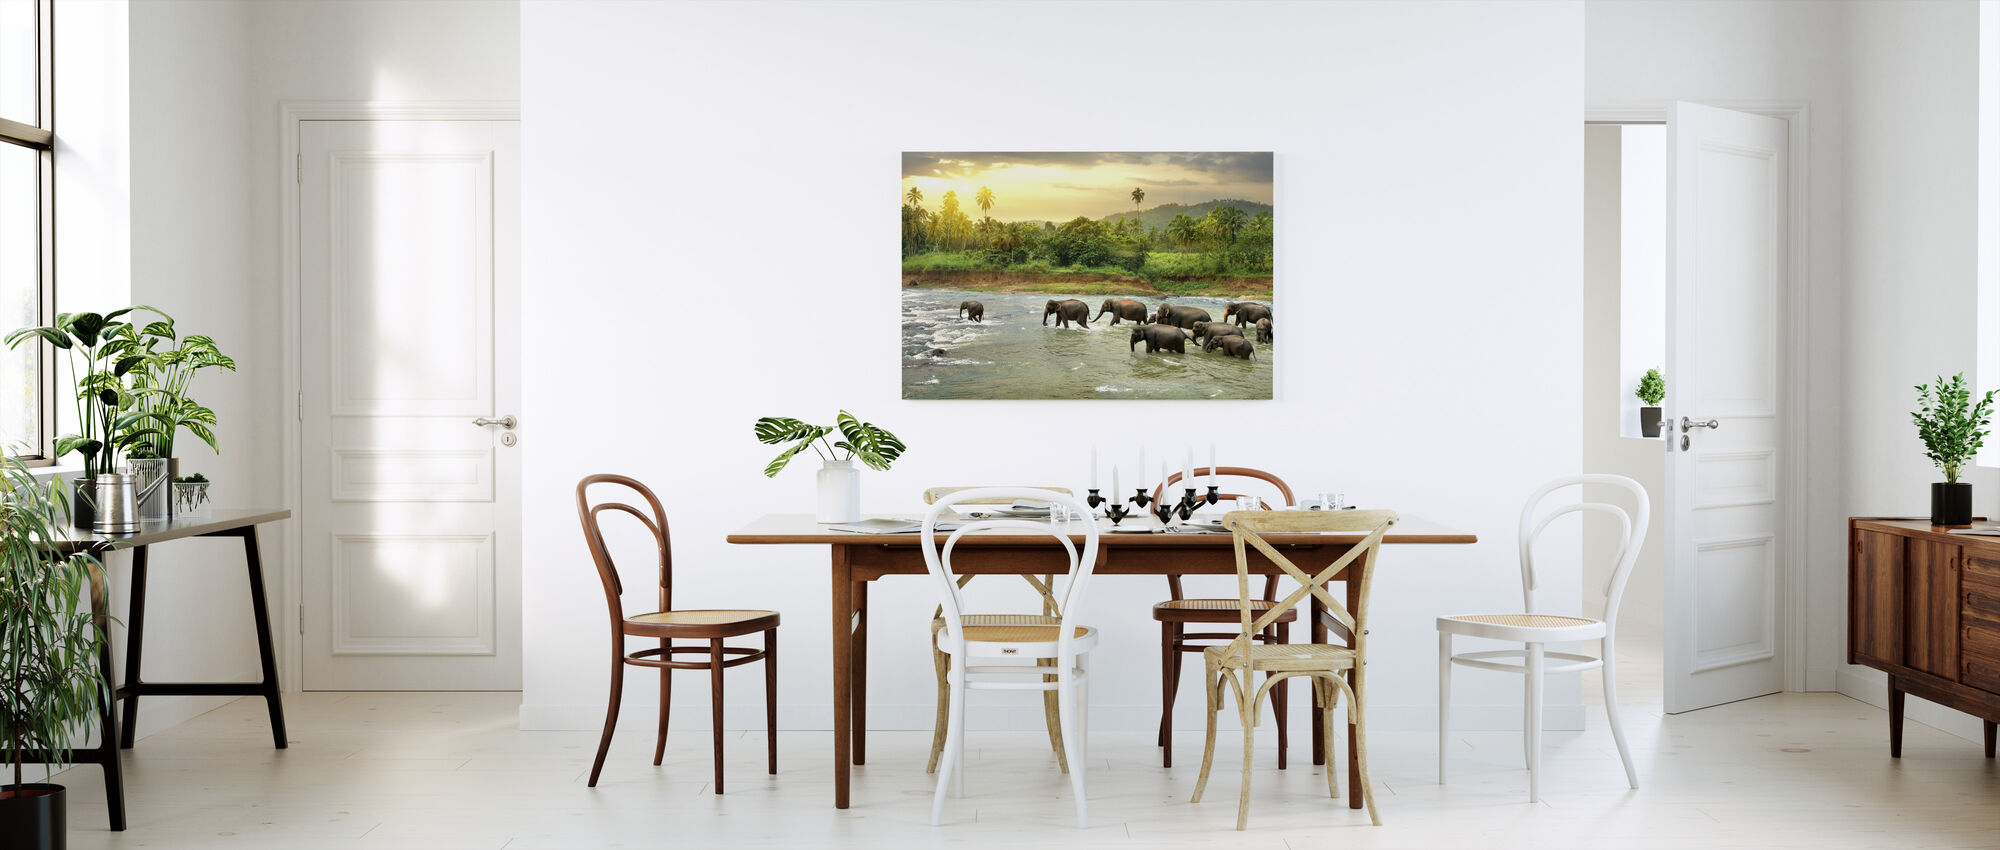 Wading Olifant kudde - Canvas print - Keuken